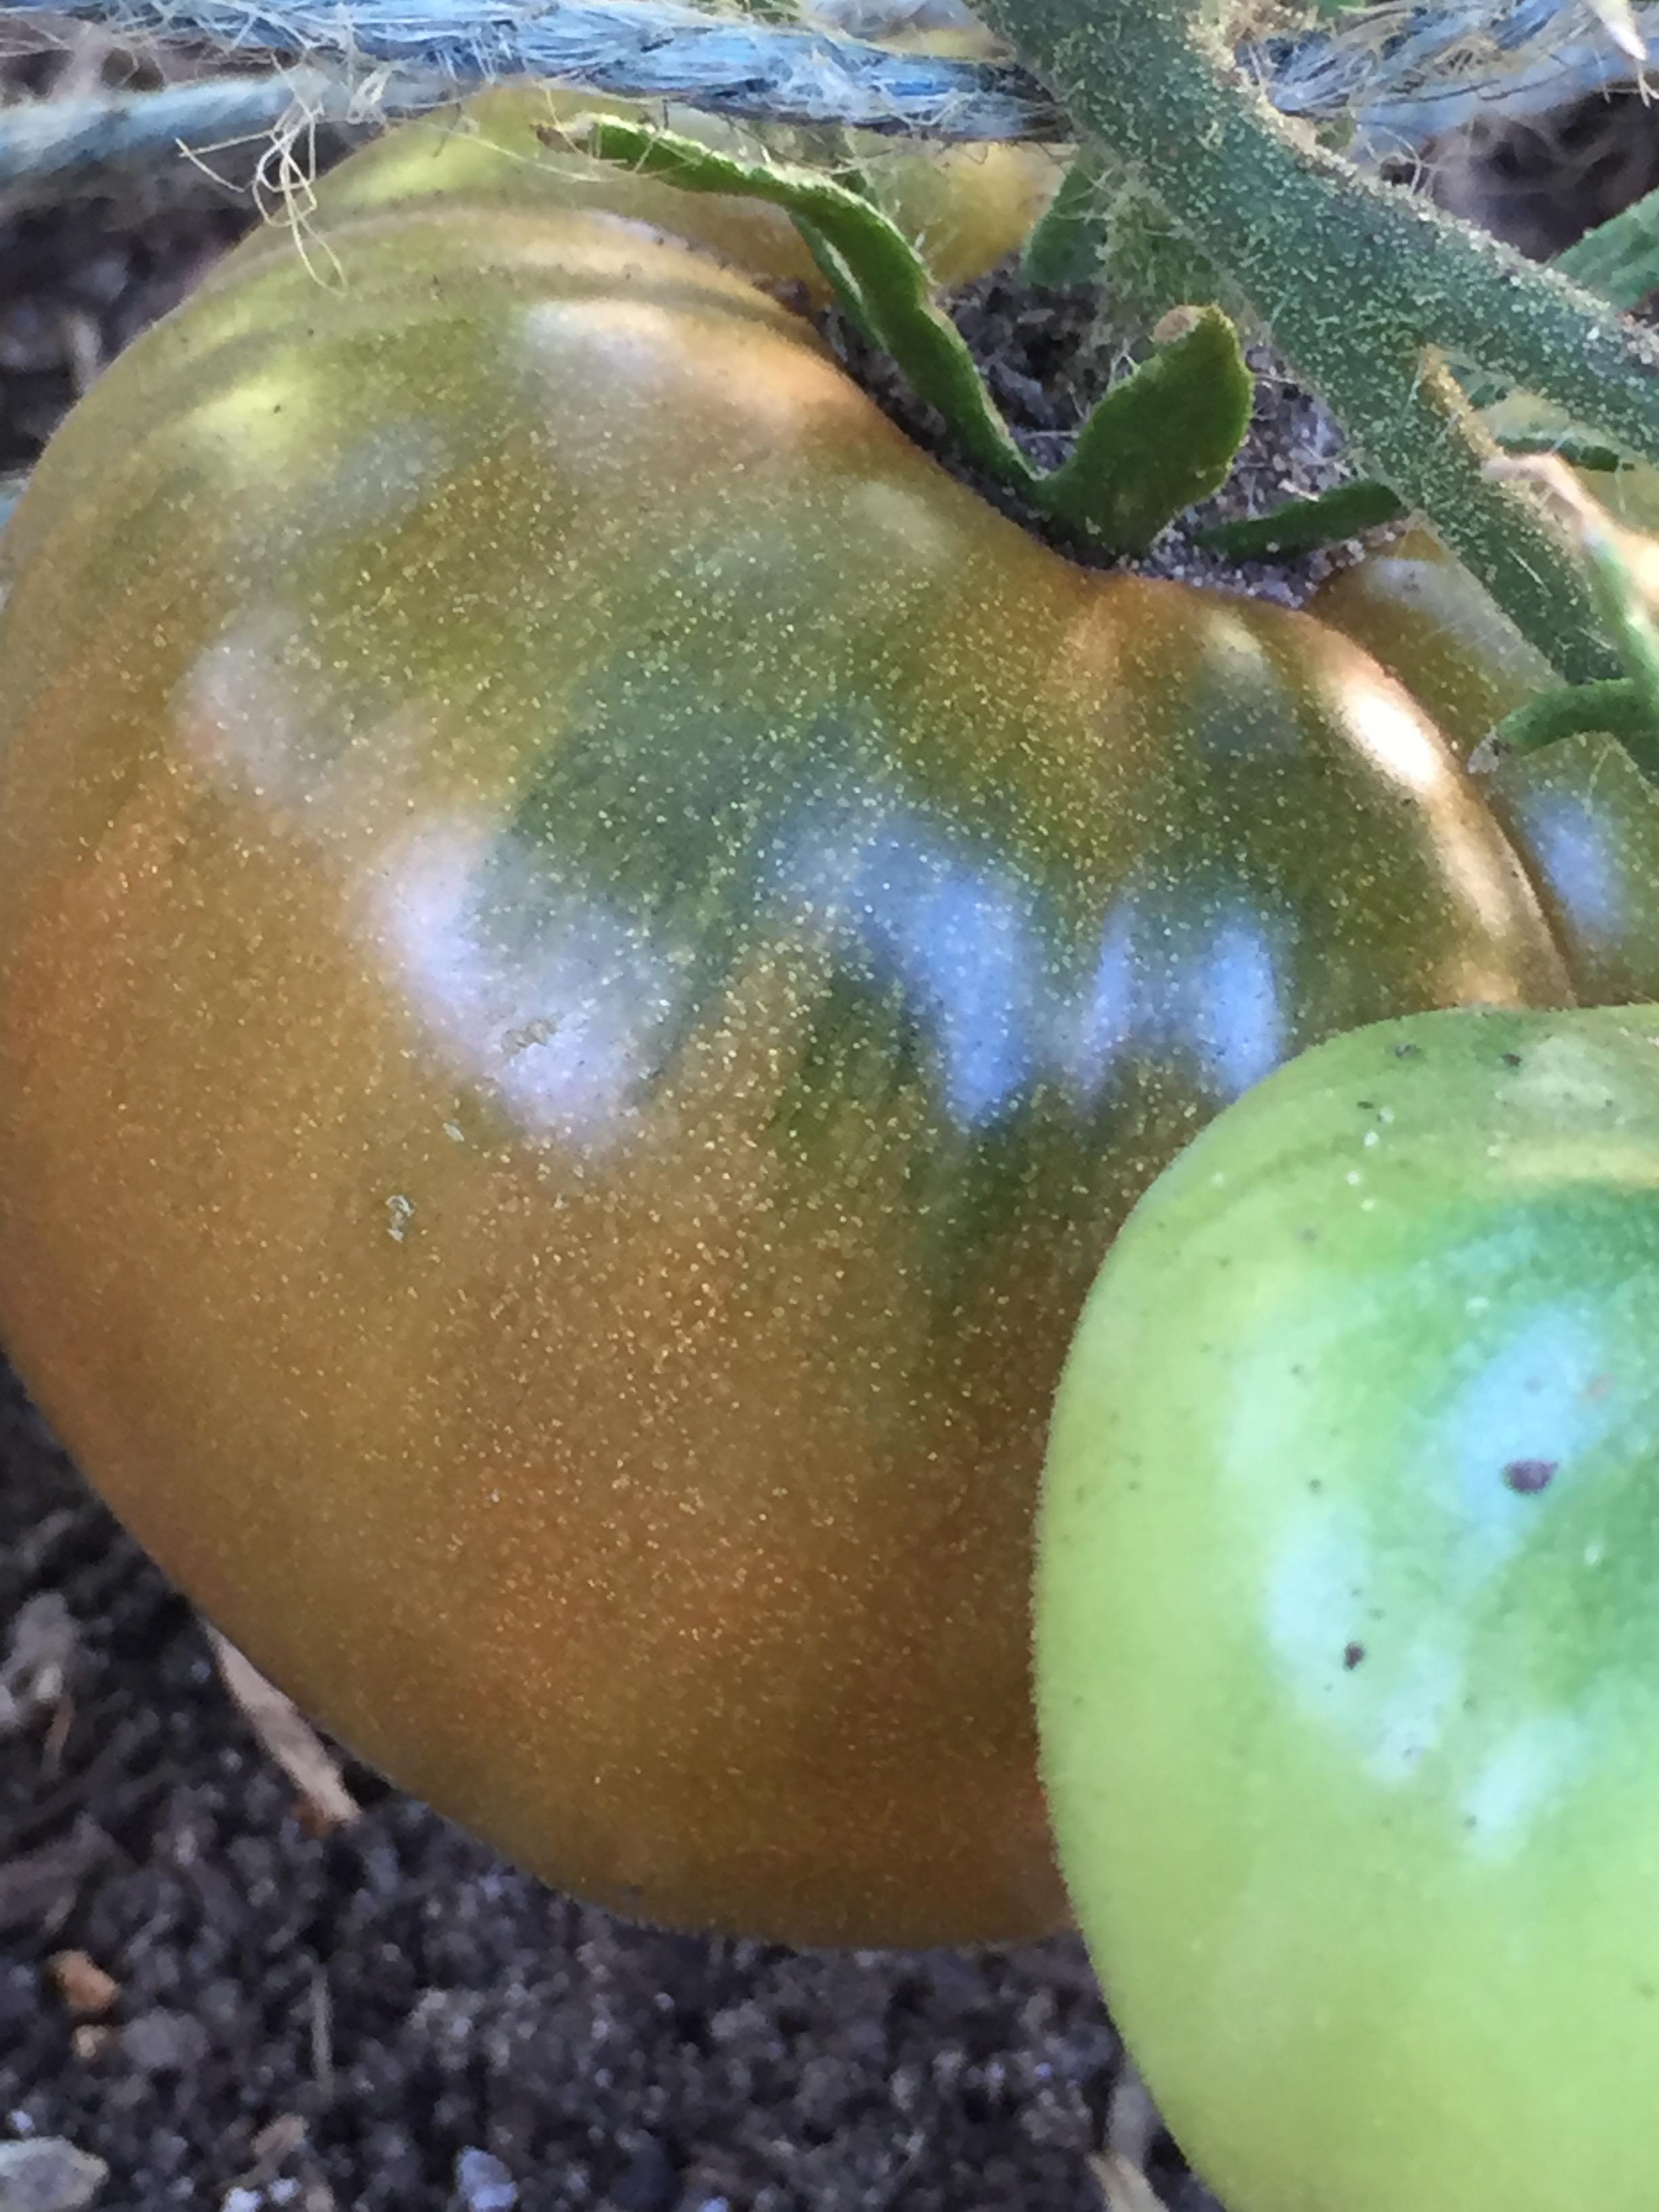 'Cherokee Purple' tomato